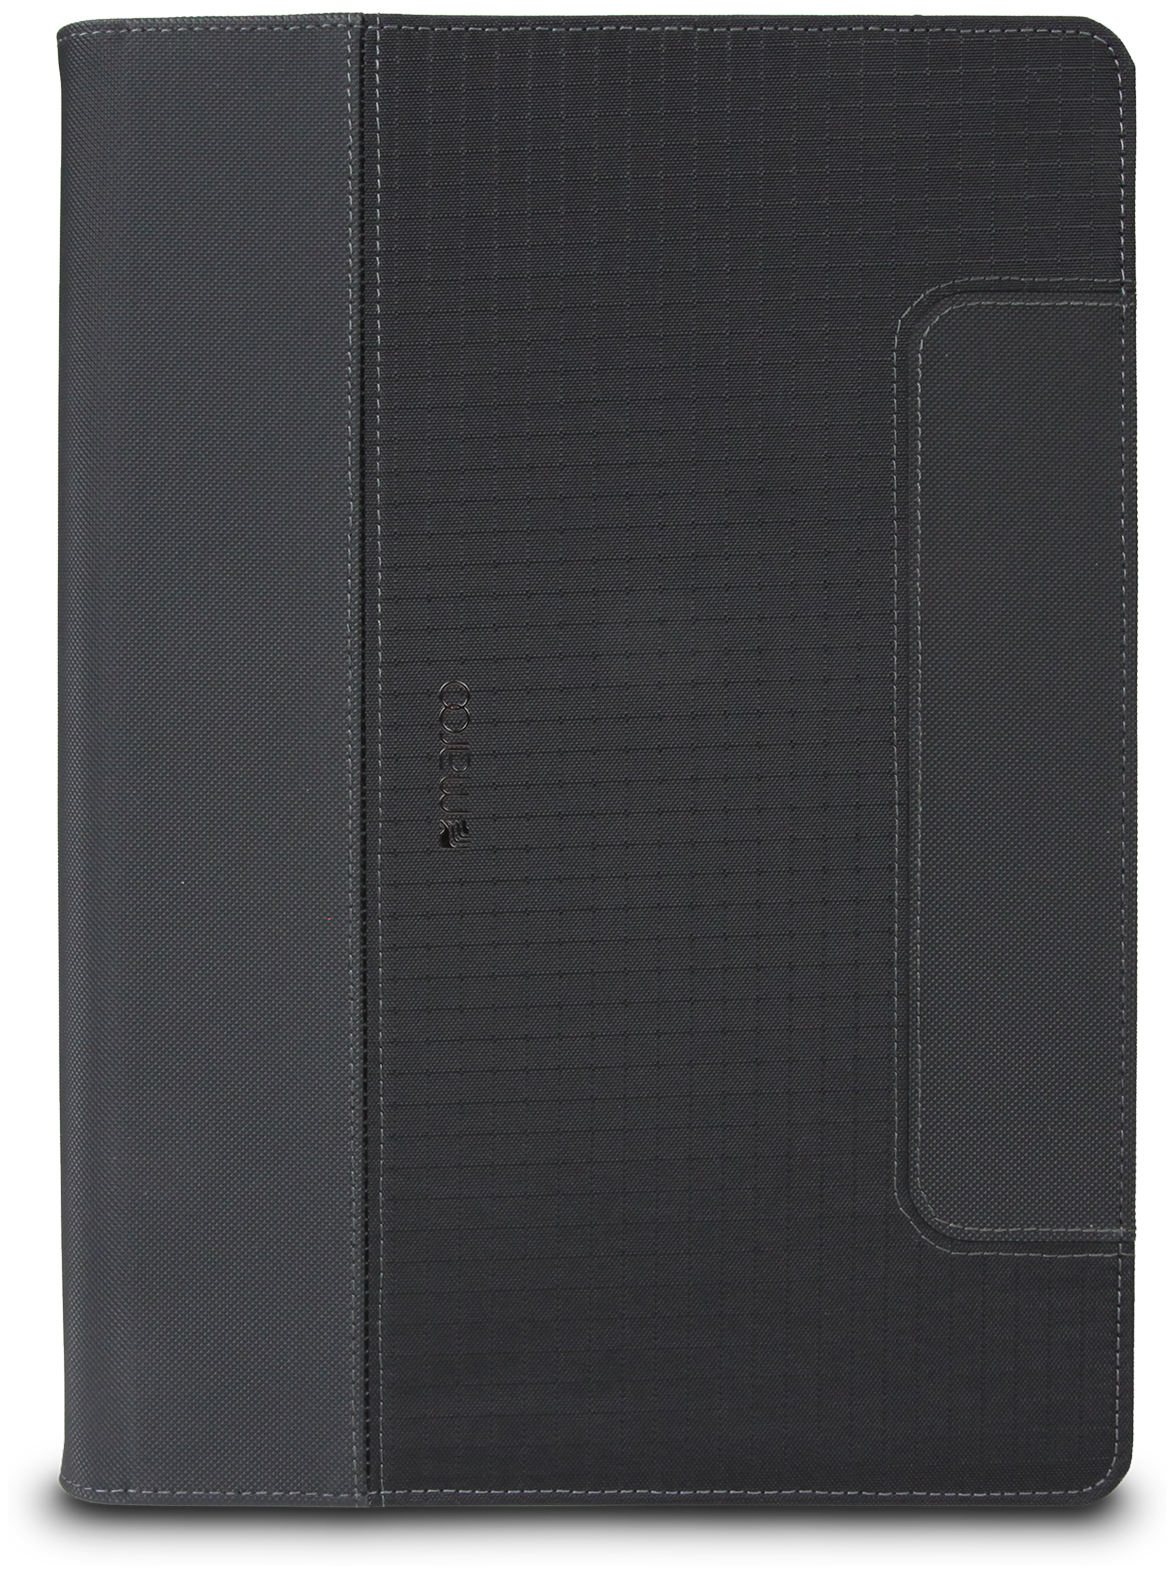 MAROO Surface Pro 3/4 Tactical Series Black Nylon w/Ripstop Fabric Folio